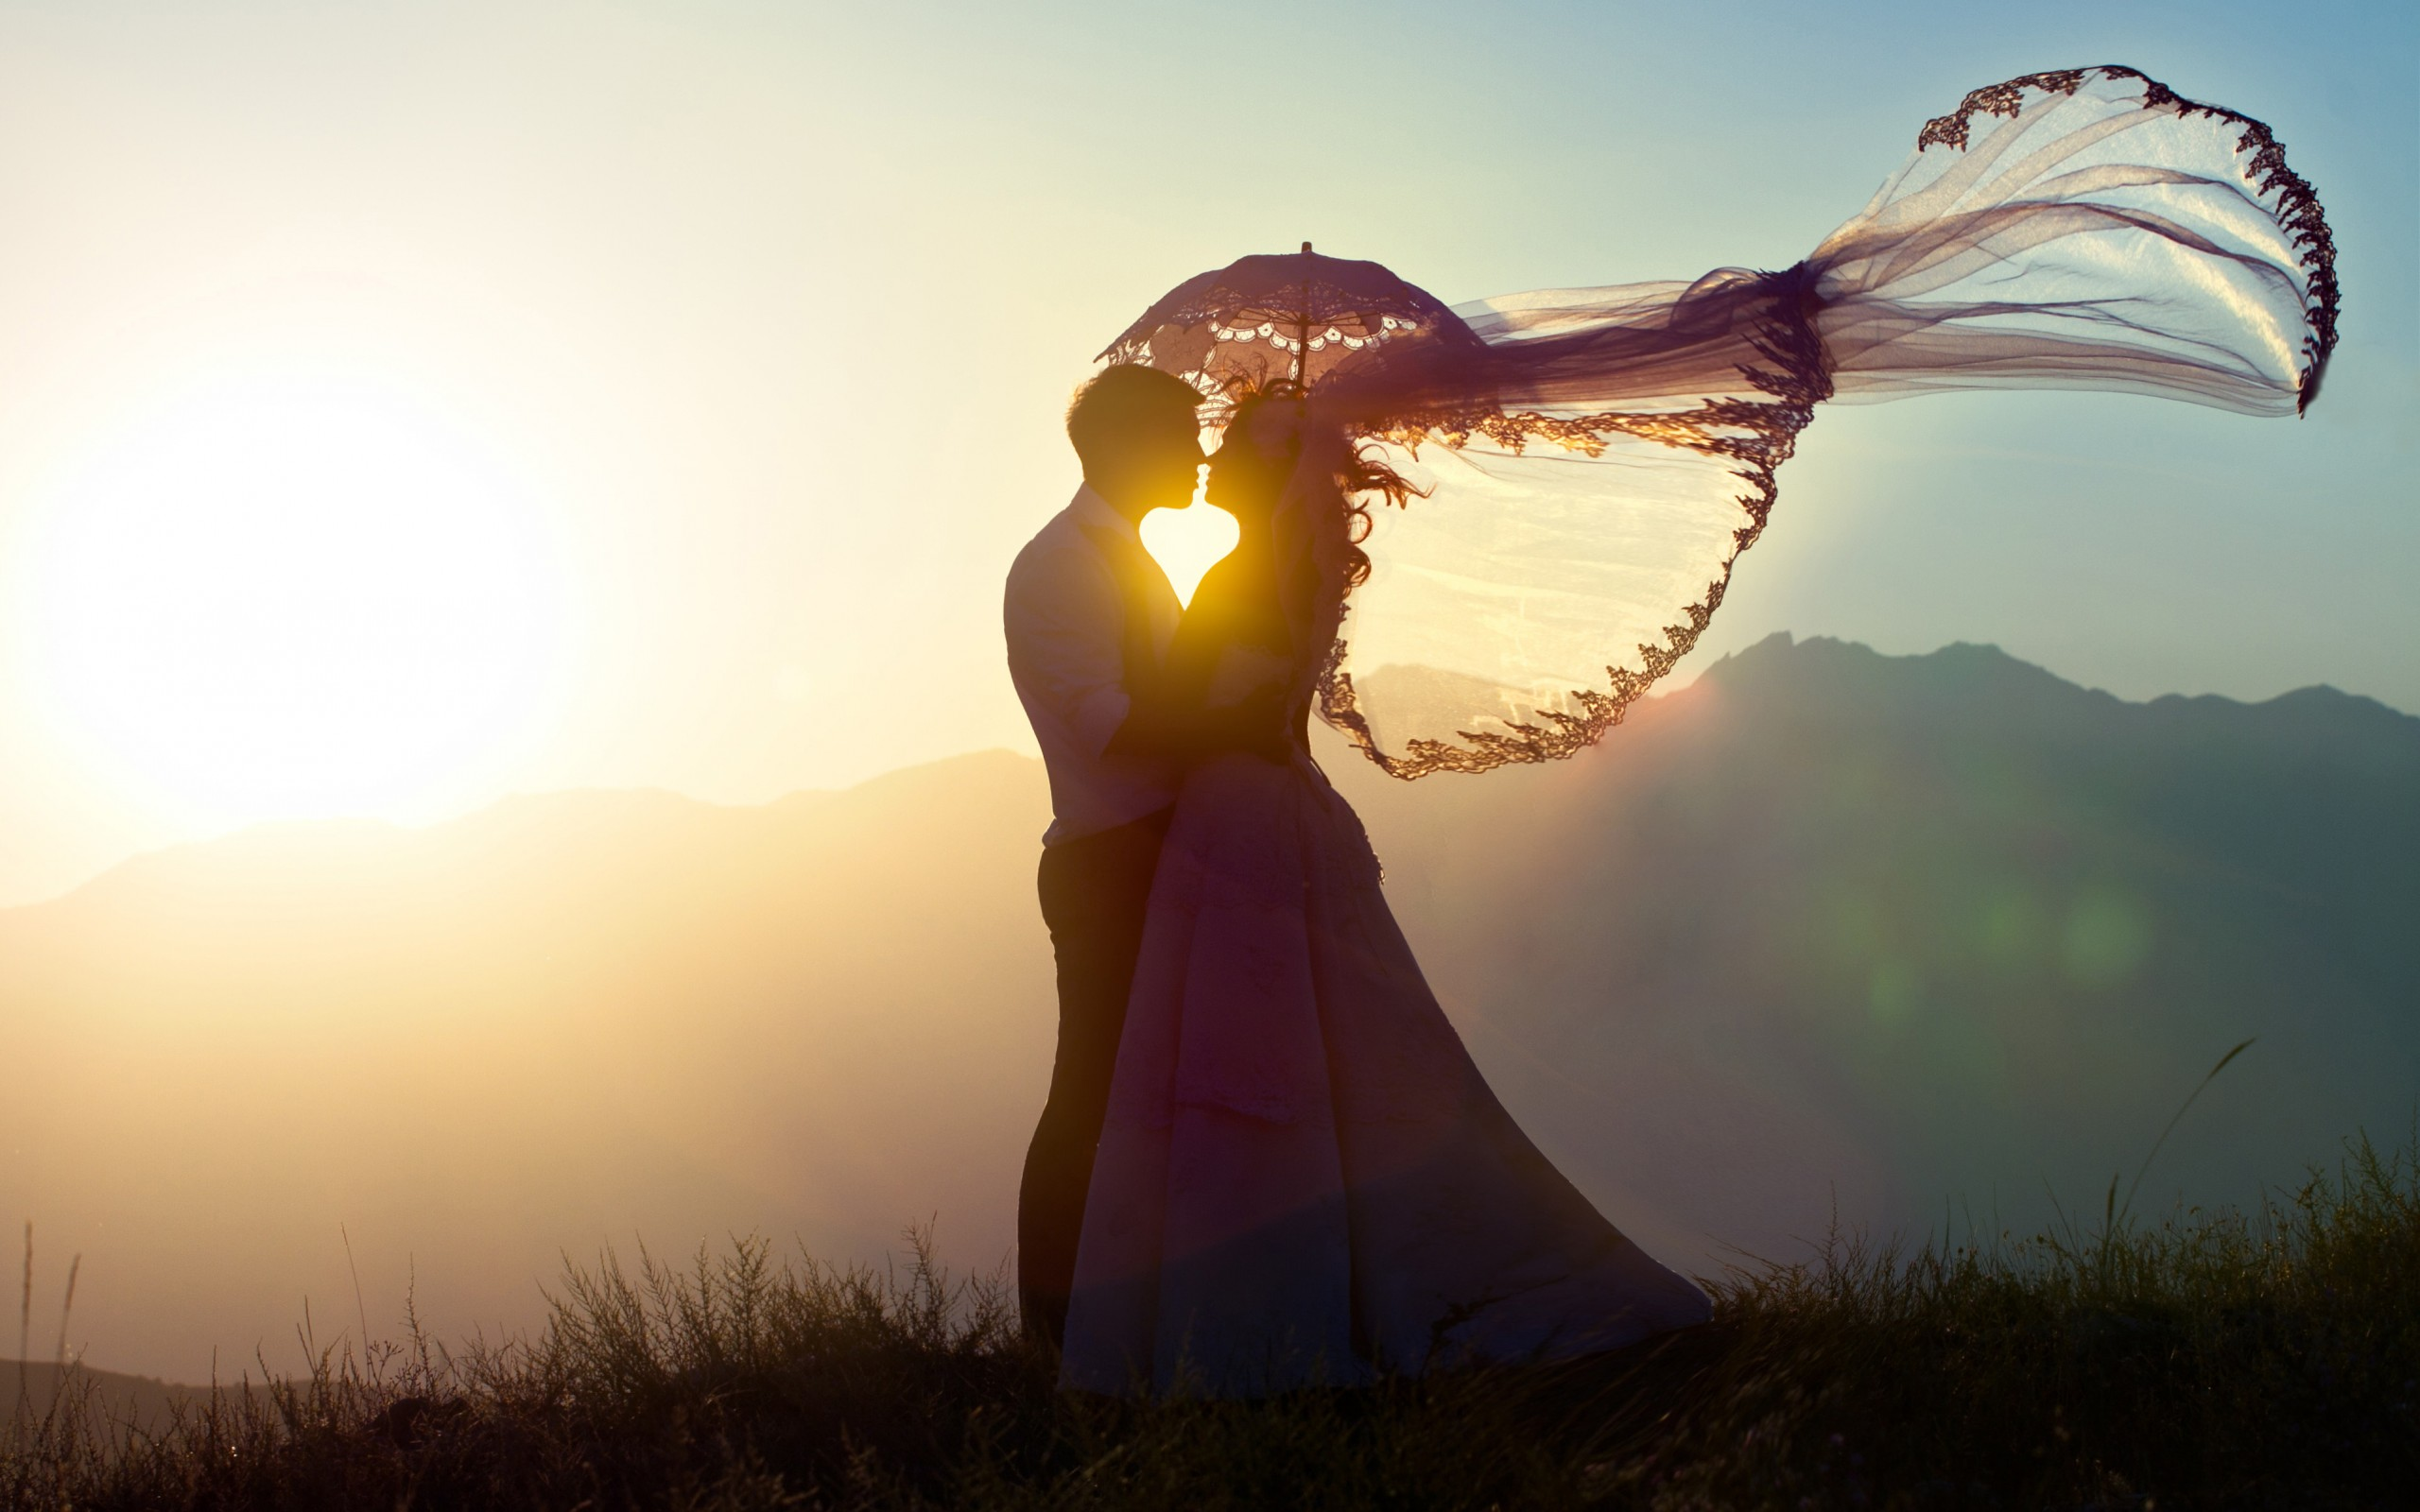 wedding couple sunset romance hd wallpapers